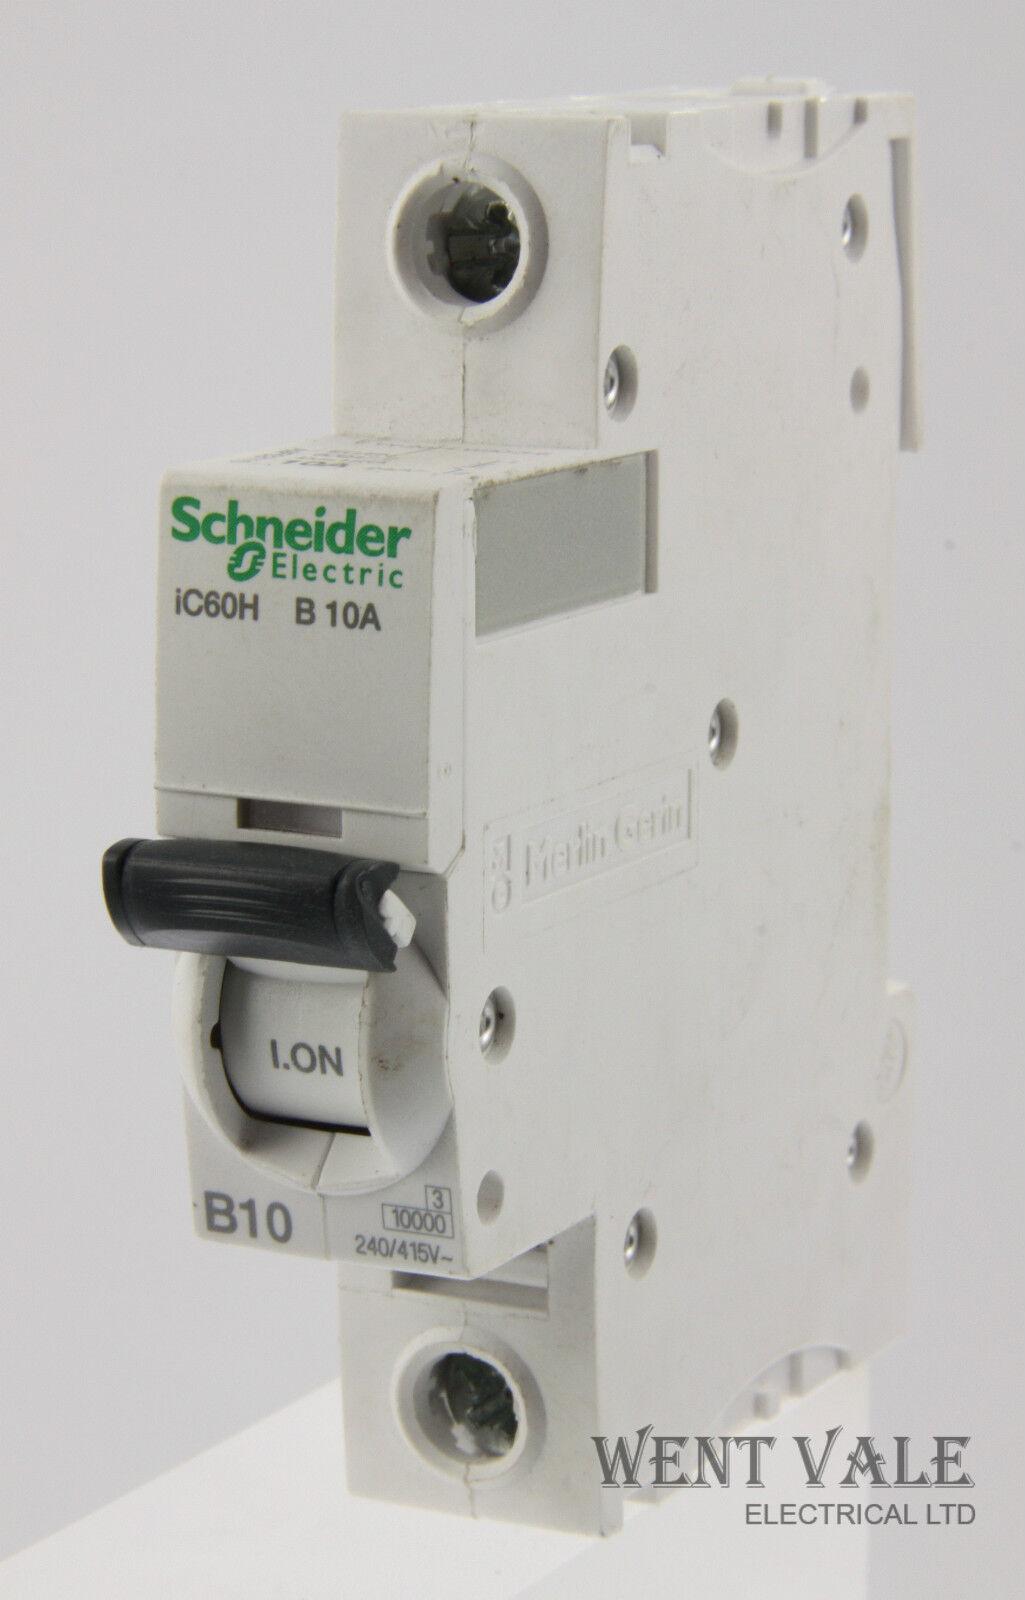 Schneider Acti 9 - iC60HB110 - 10a Type B Single Pole MCB Latest Model Unused